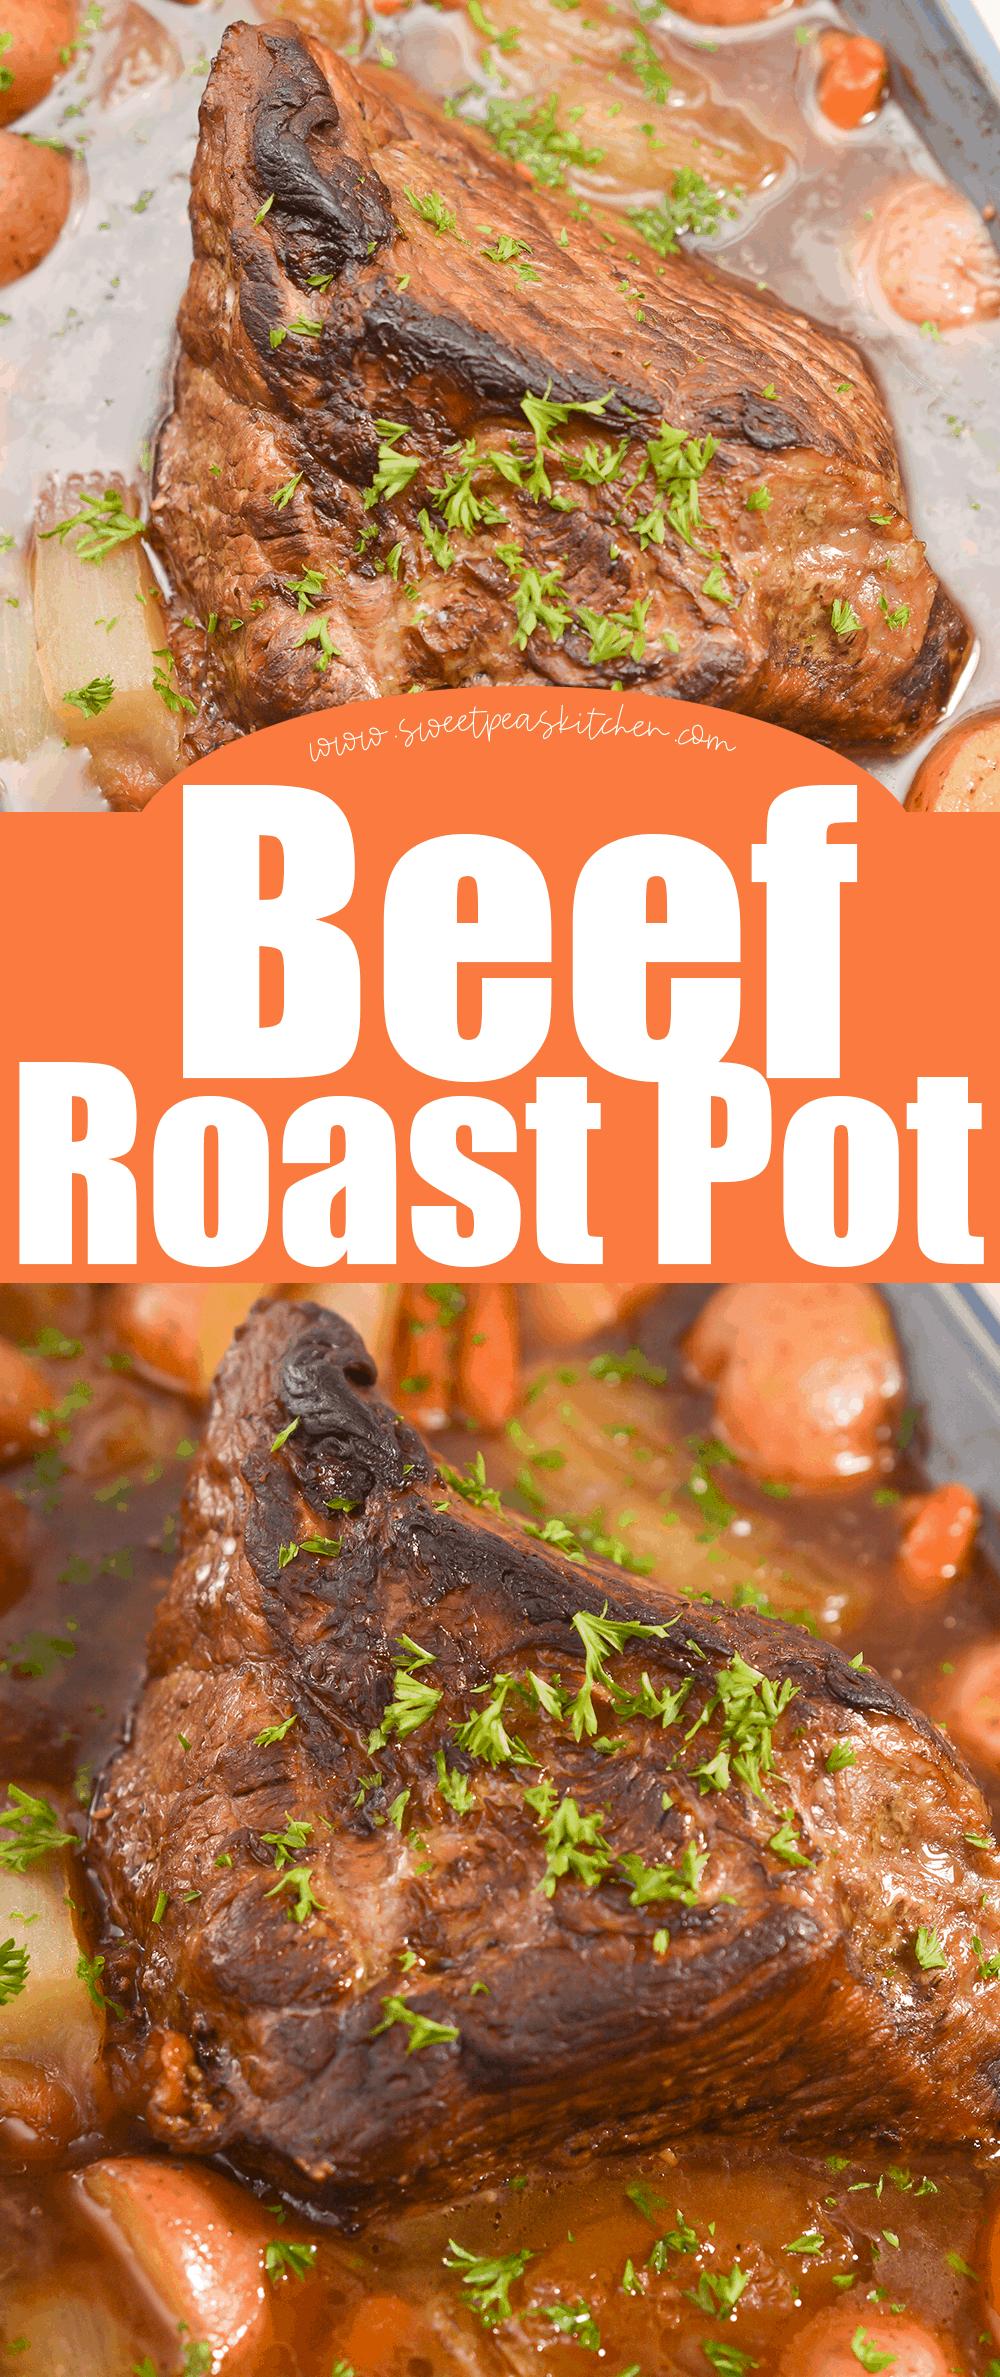 Beef Roast Pot